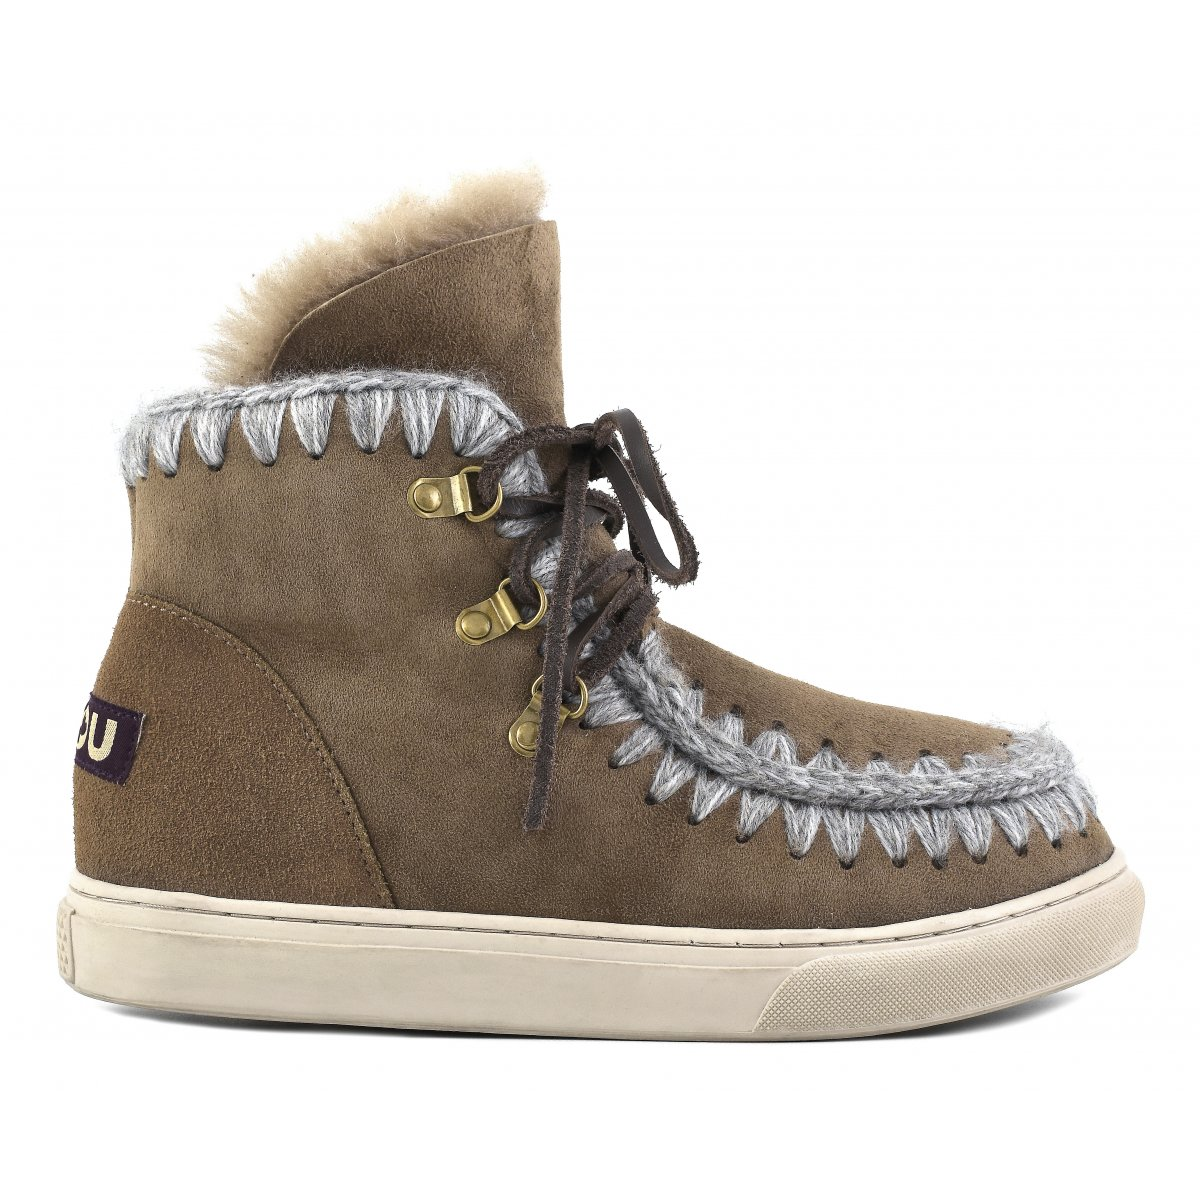 sneakers fall lace sneaker mou women up winter ED29HI